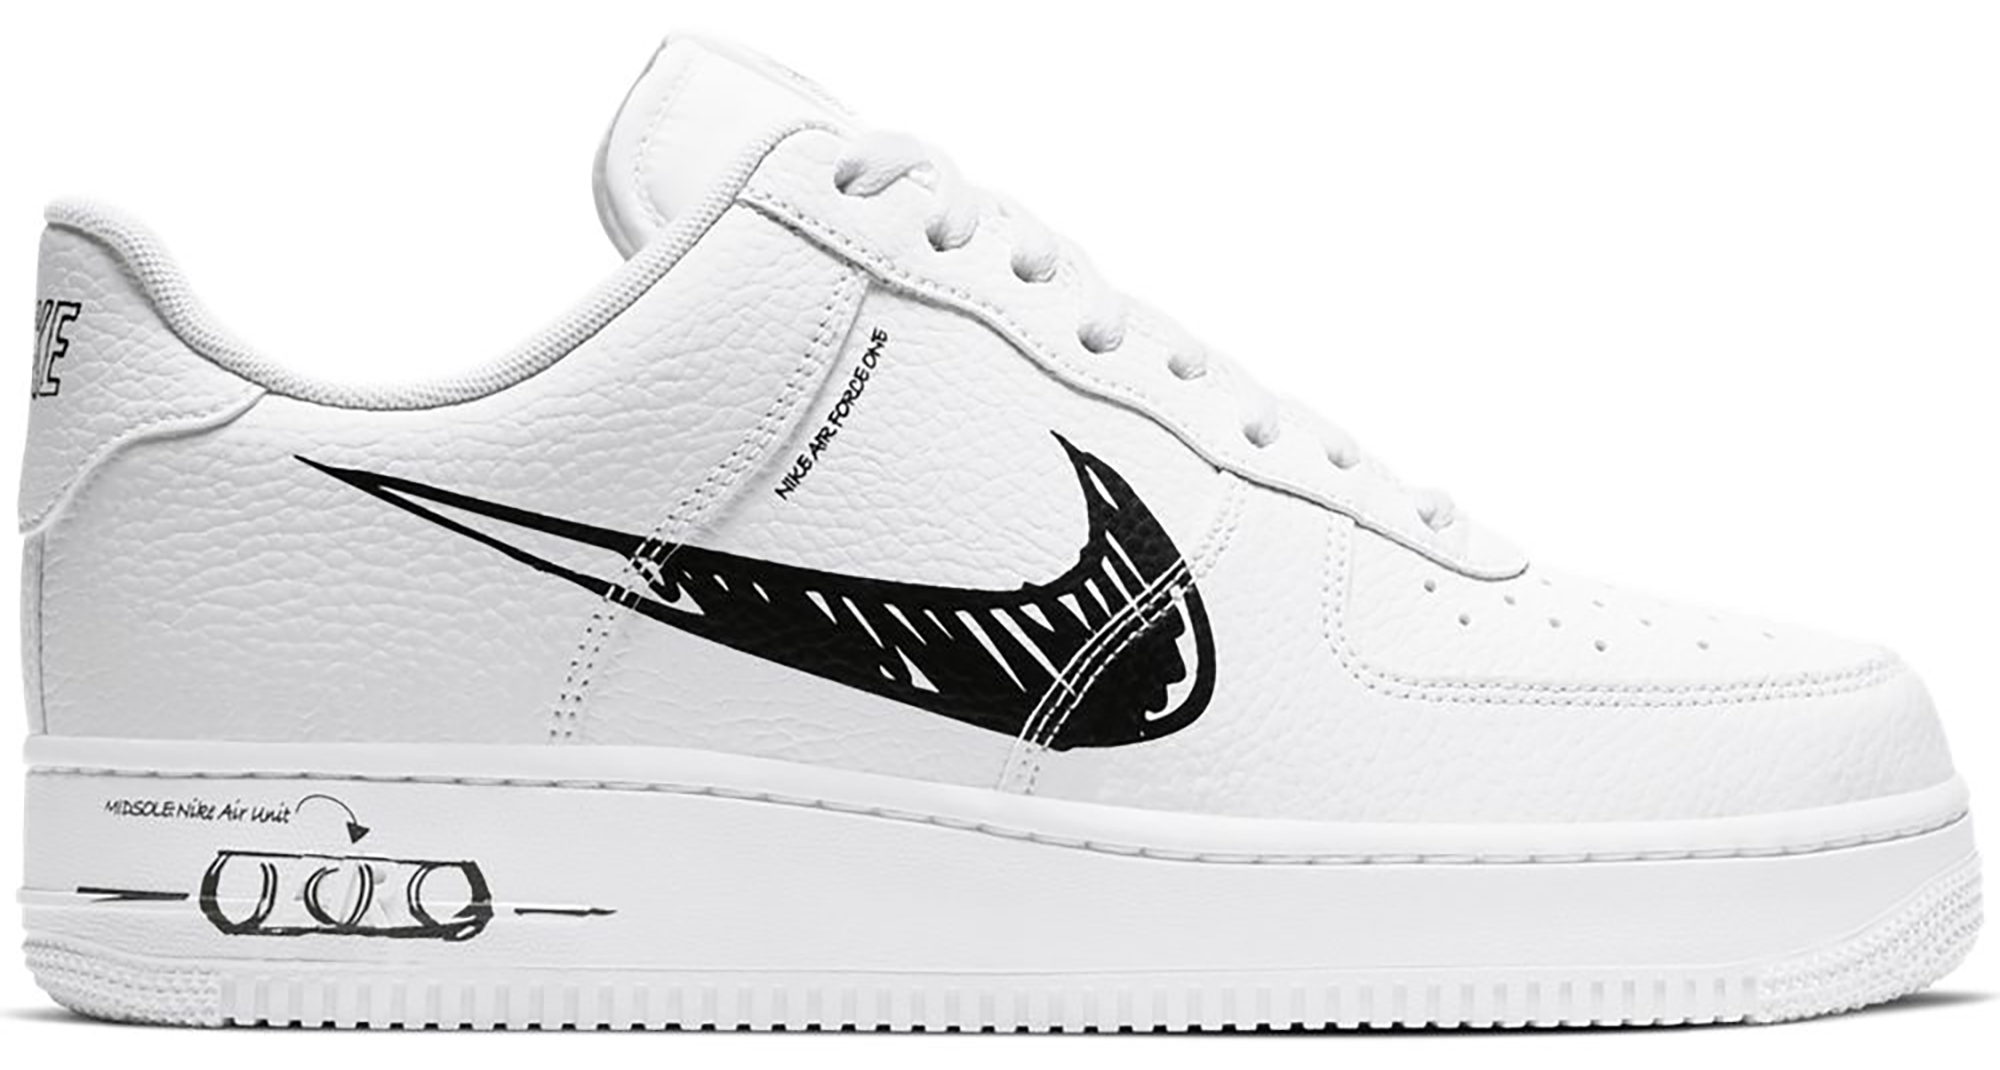 Nike Air Force 1 Low Sketch White Black